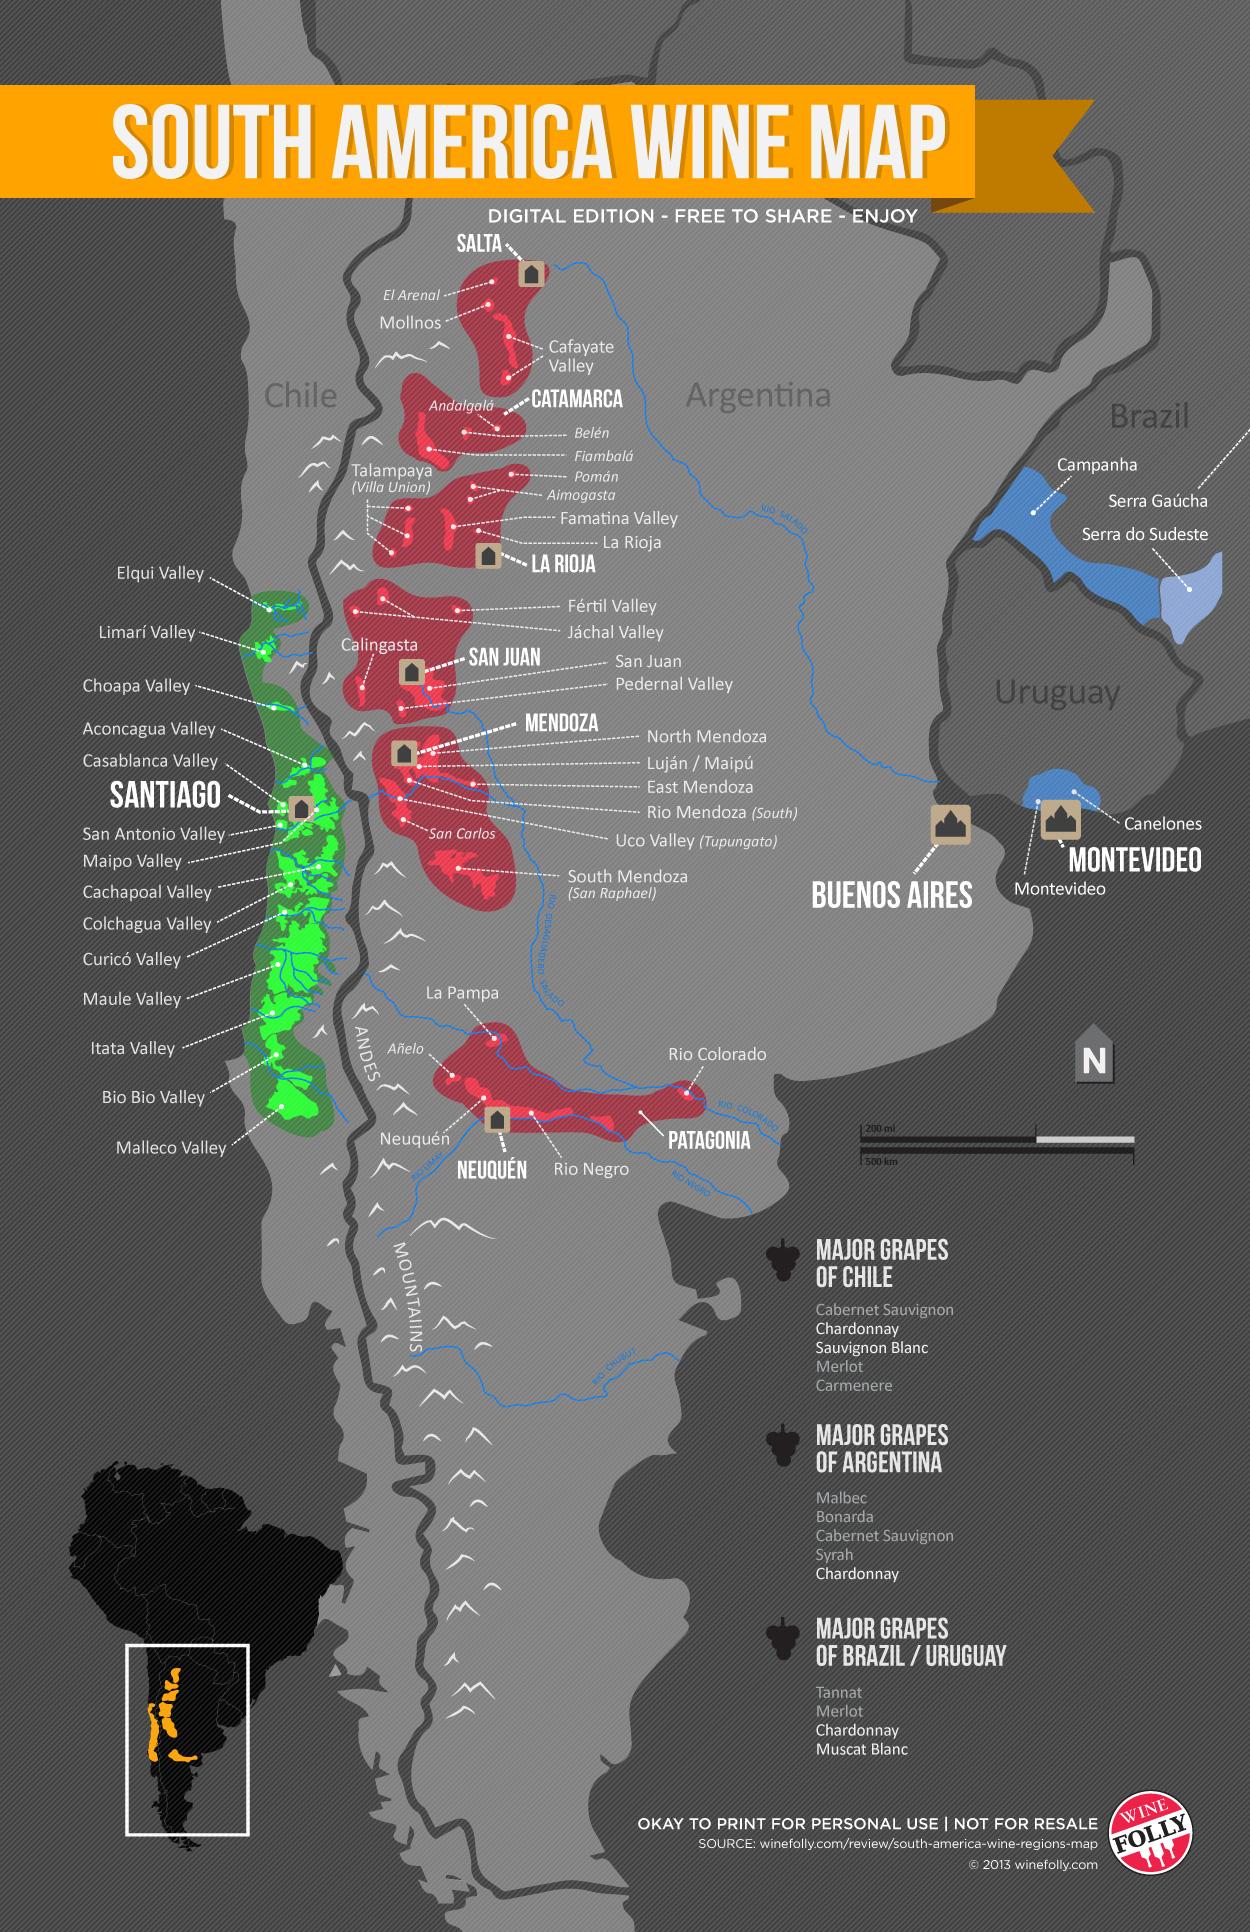 South America Wine Regions Map | Wine Folly on